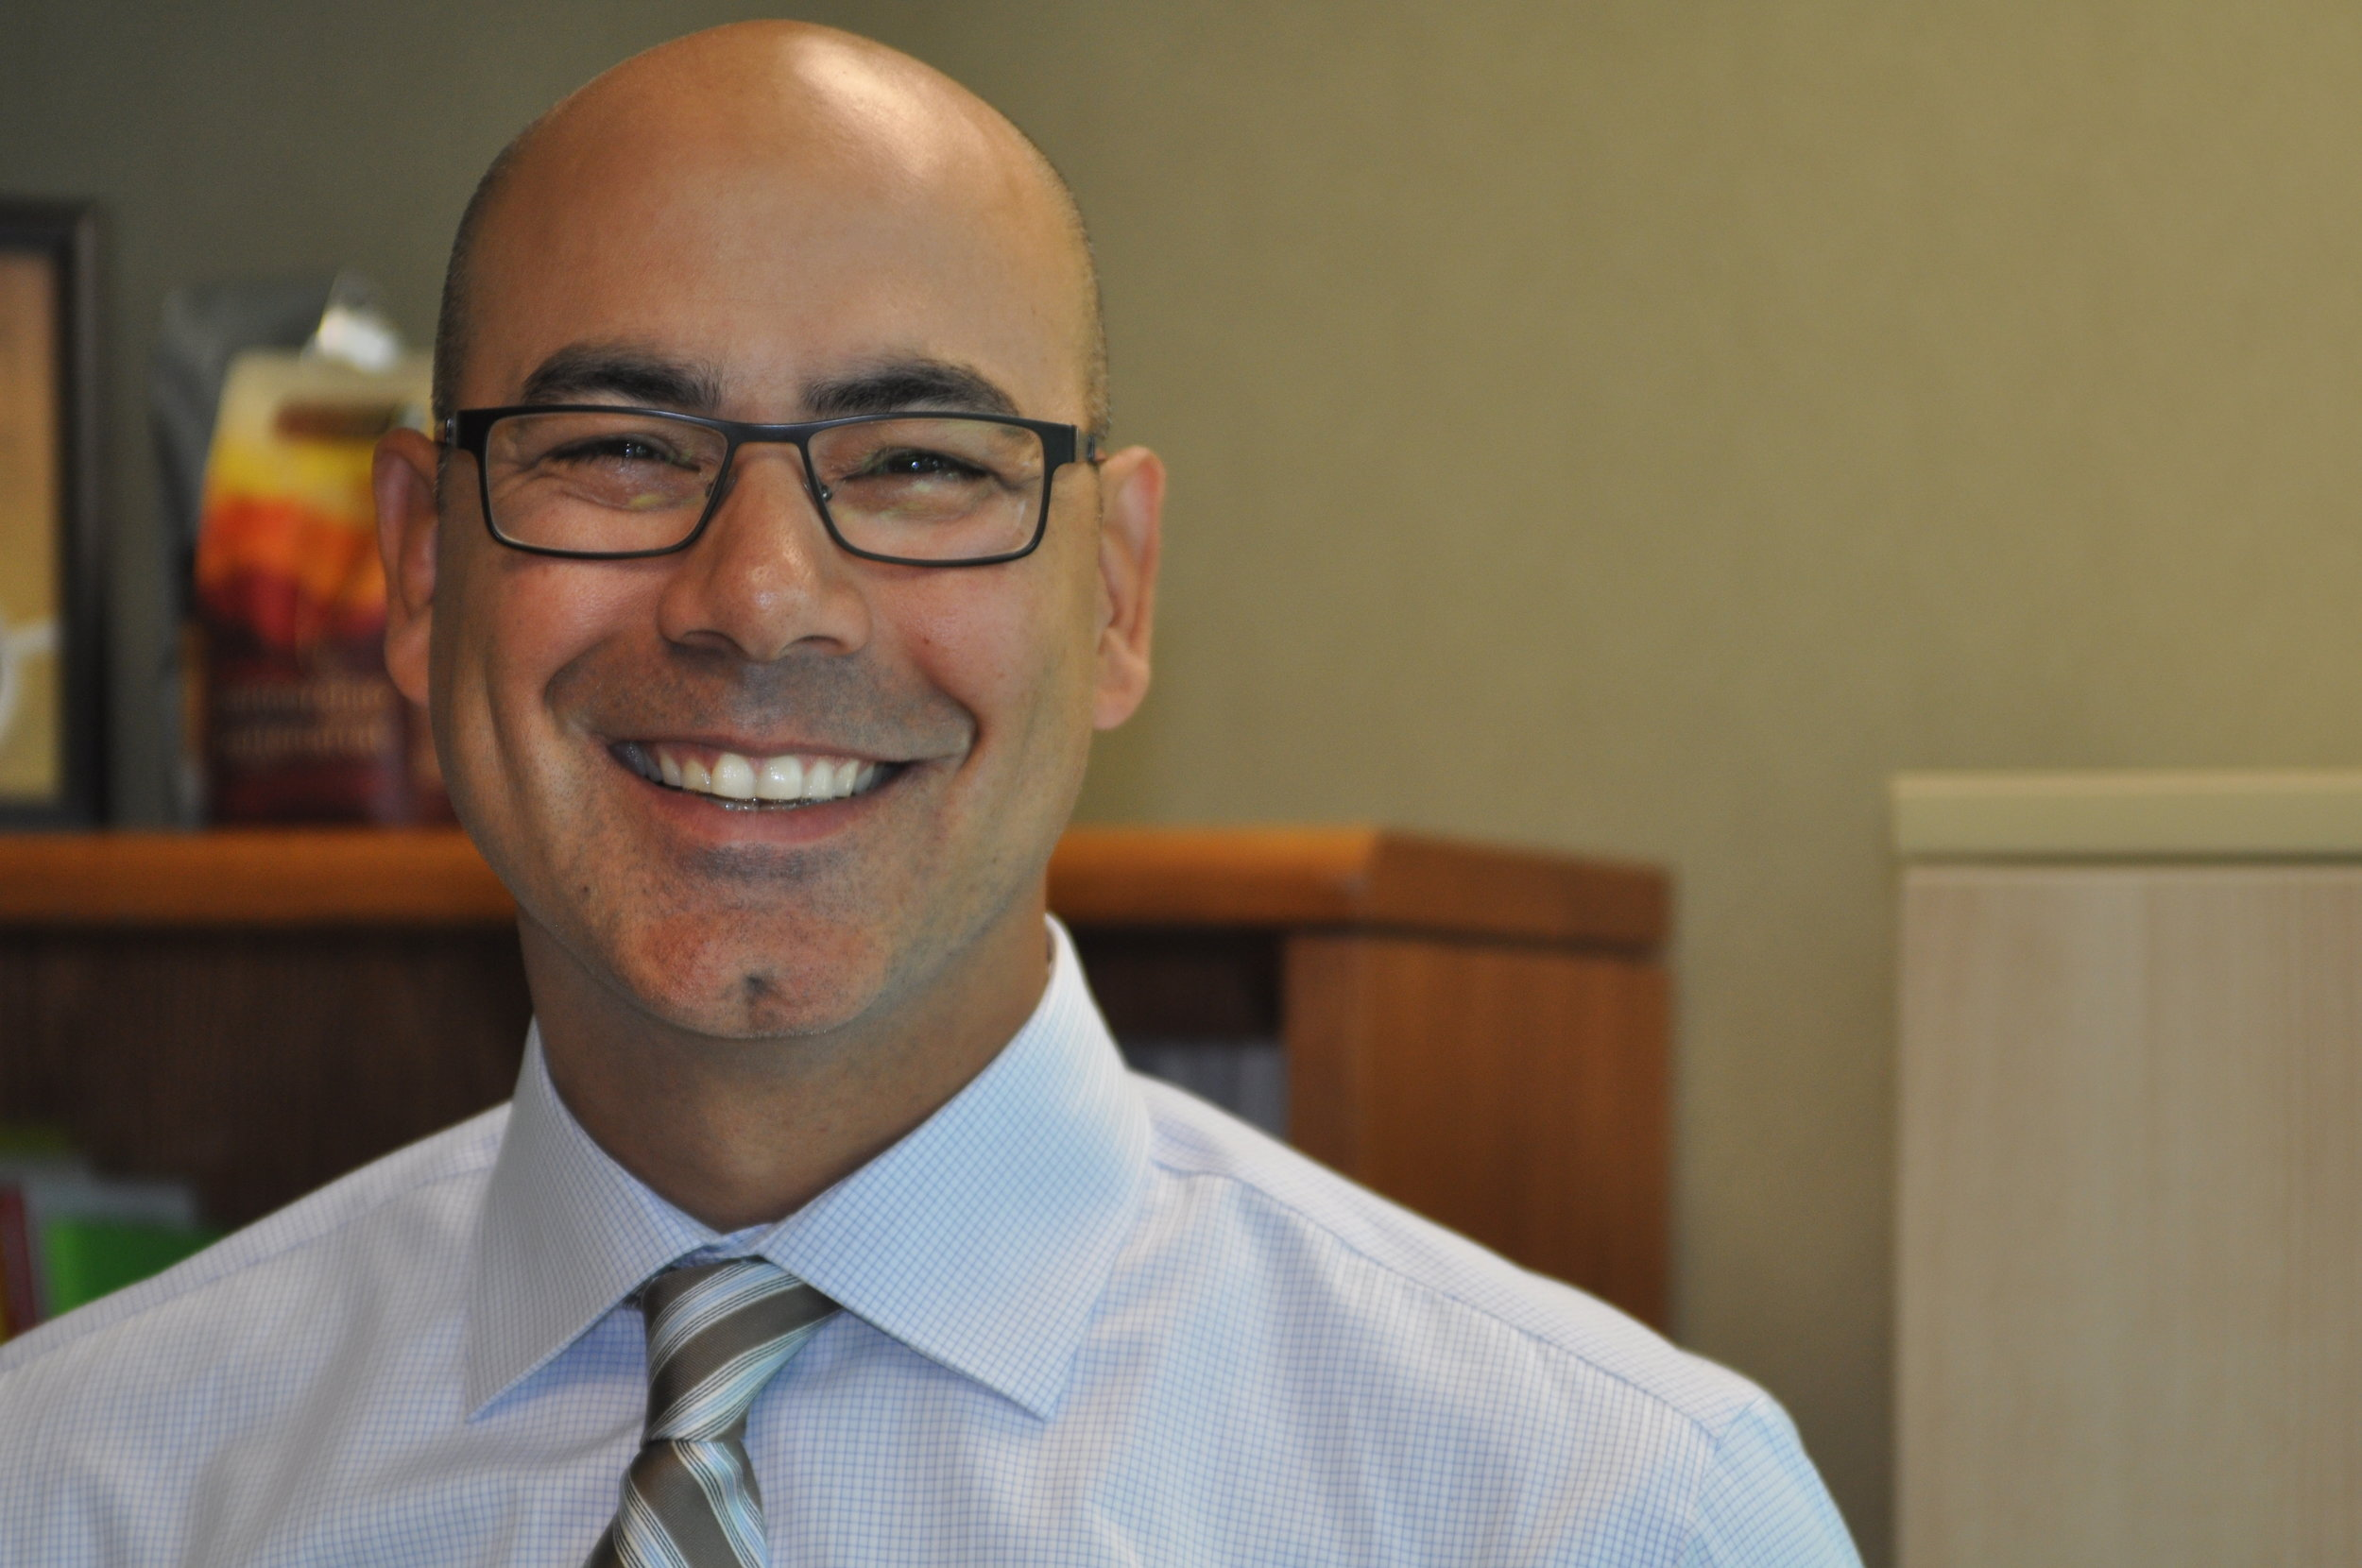 Tim Faveri, VP Sustainability & Shared Value, Maple Leaf Foods